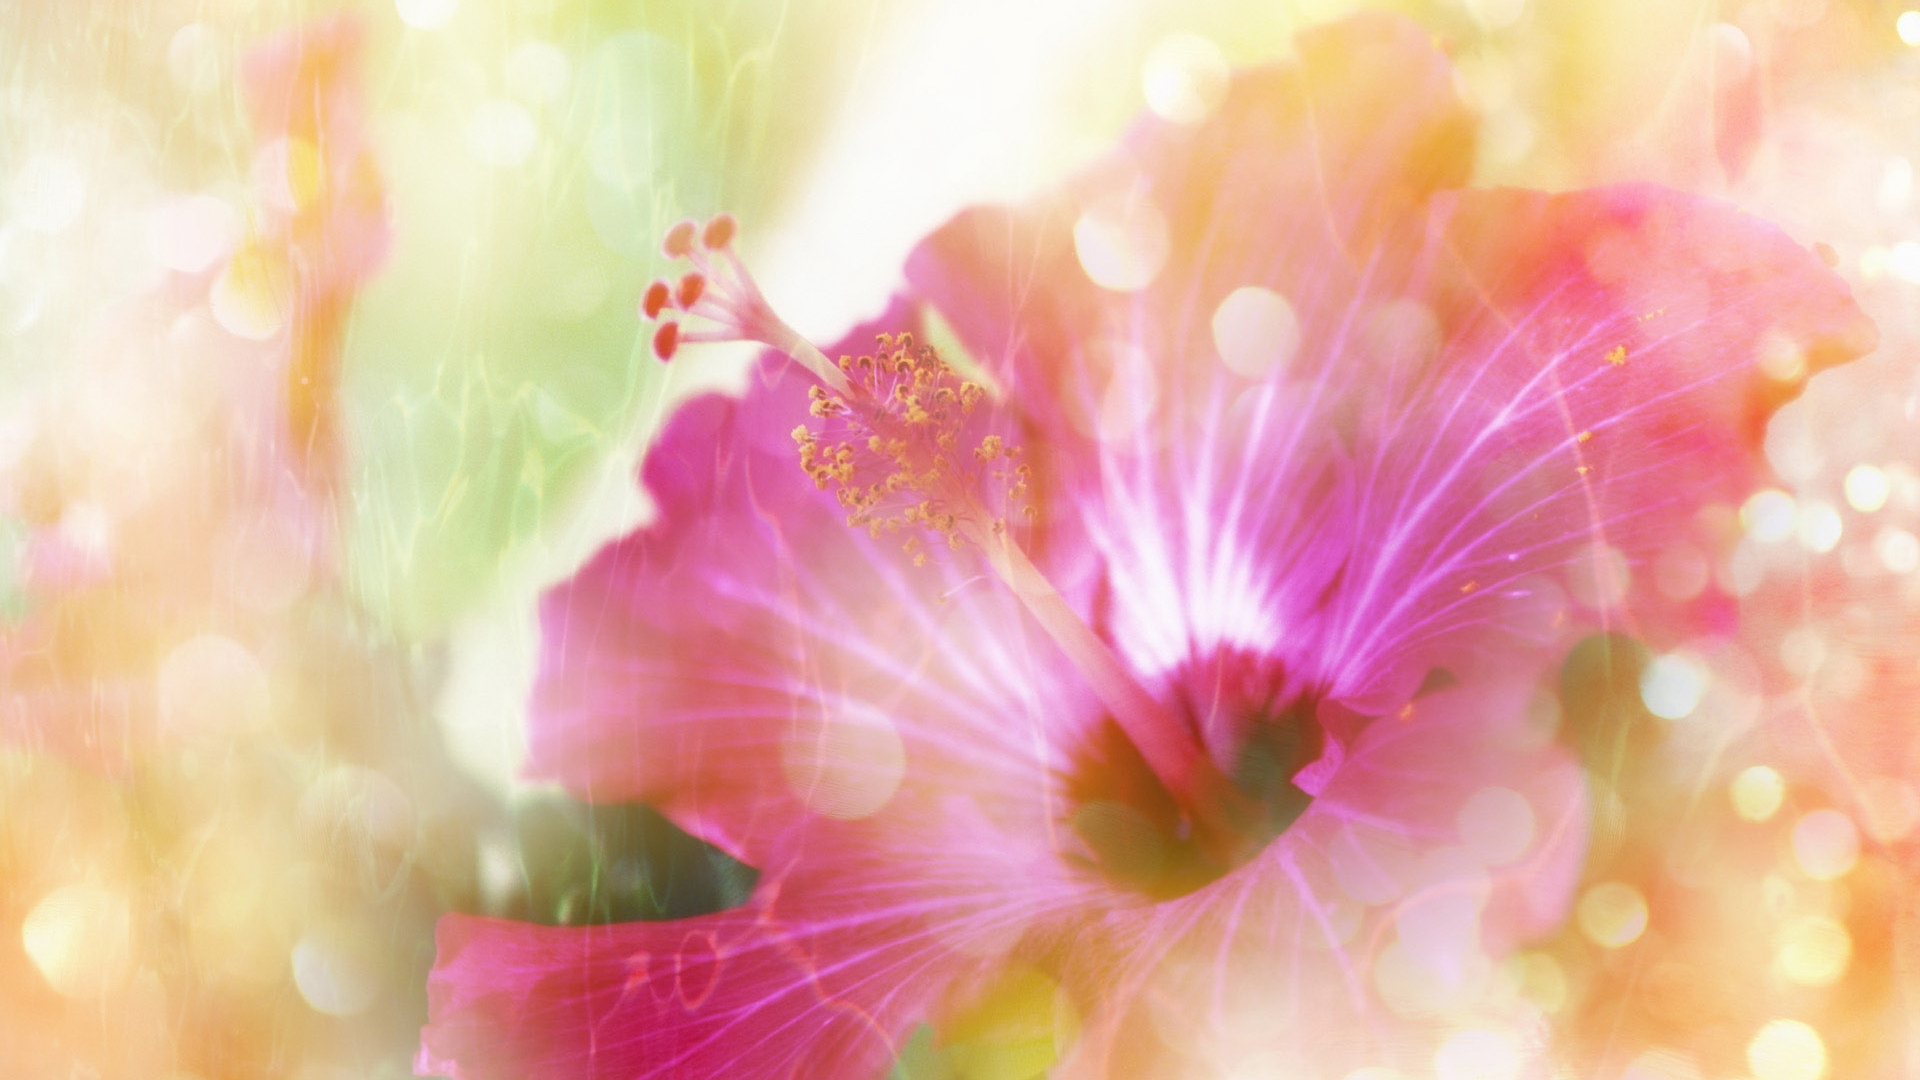 http://fs1.directupload.net/images/150705/2gle6lpo.jpg